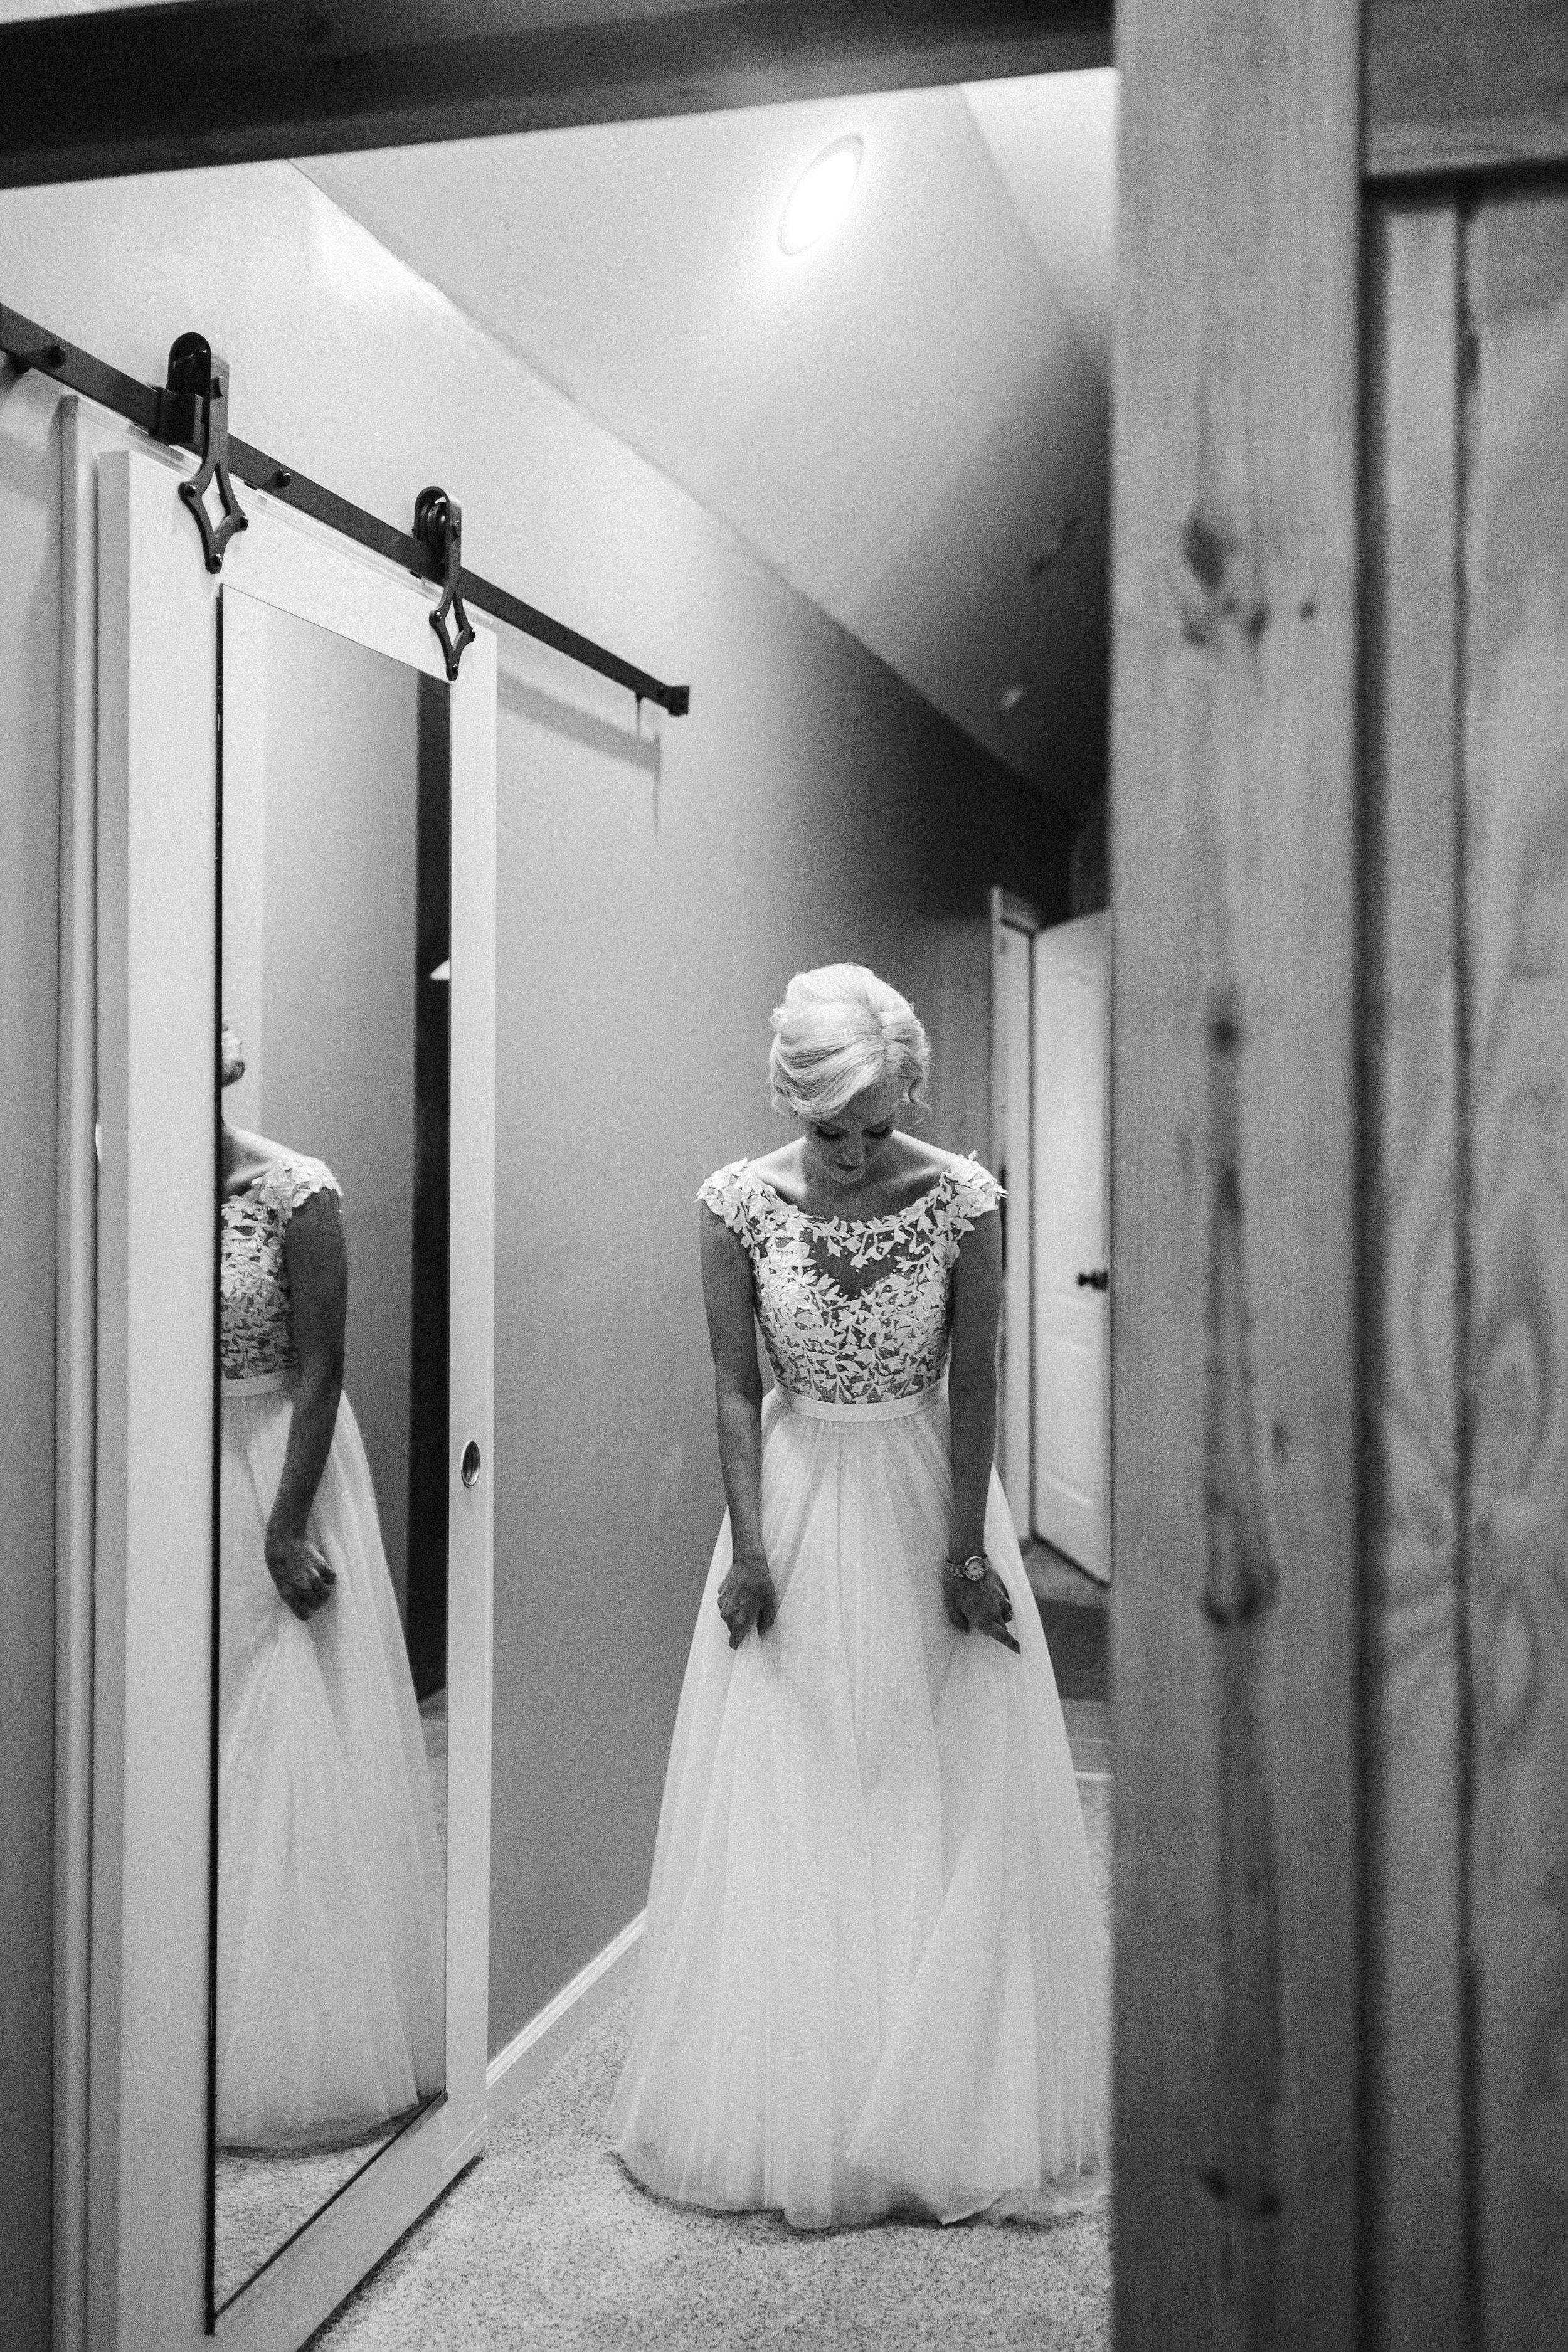 2018.09.02 Ray and Sarah Prizner Nashville TN Wedding FINALS-40.jpg